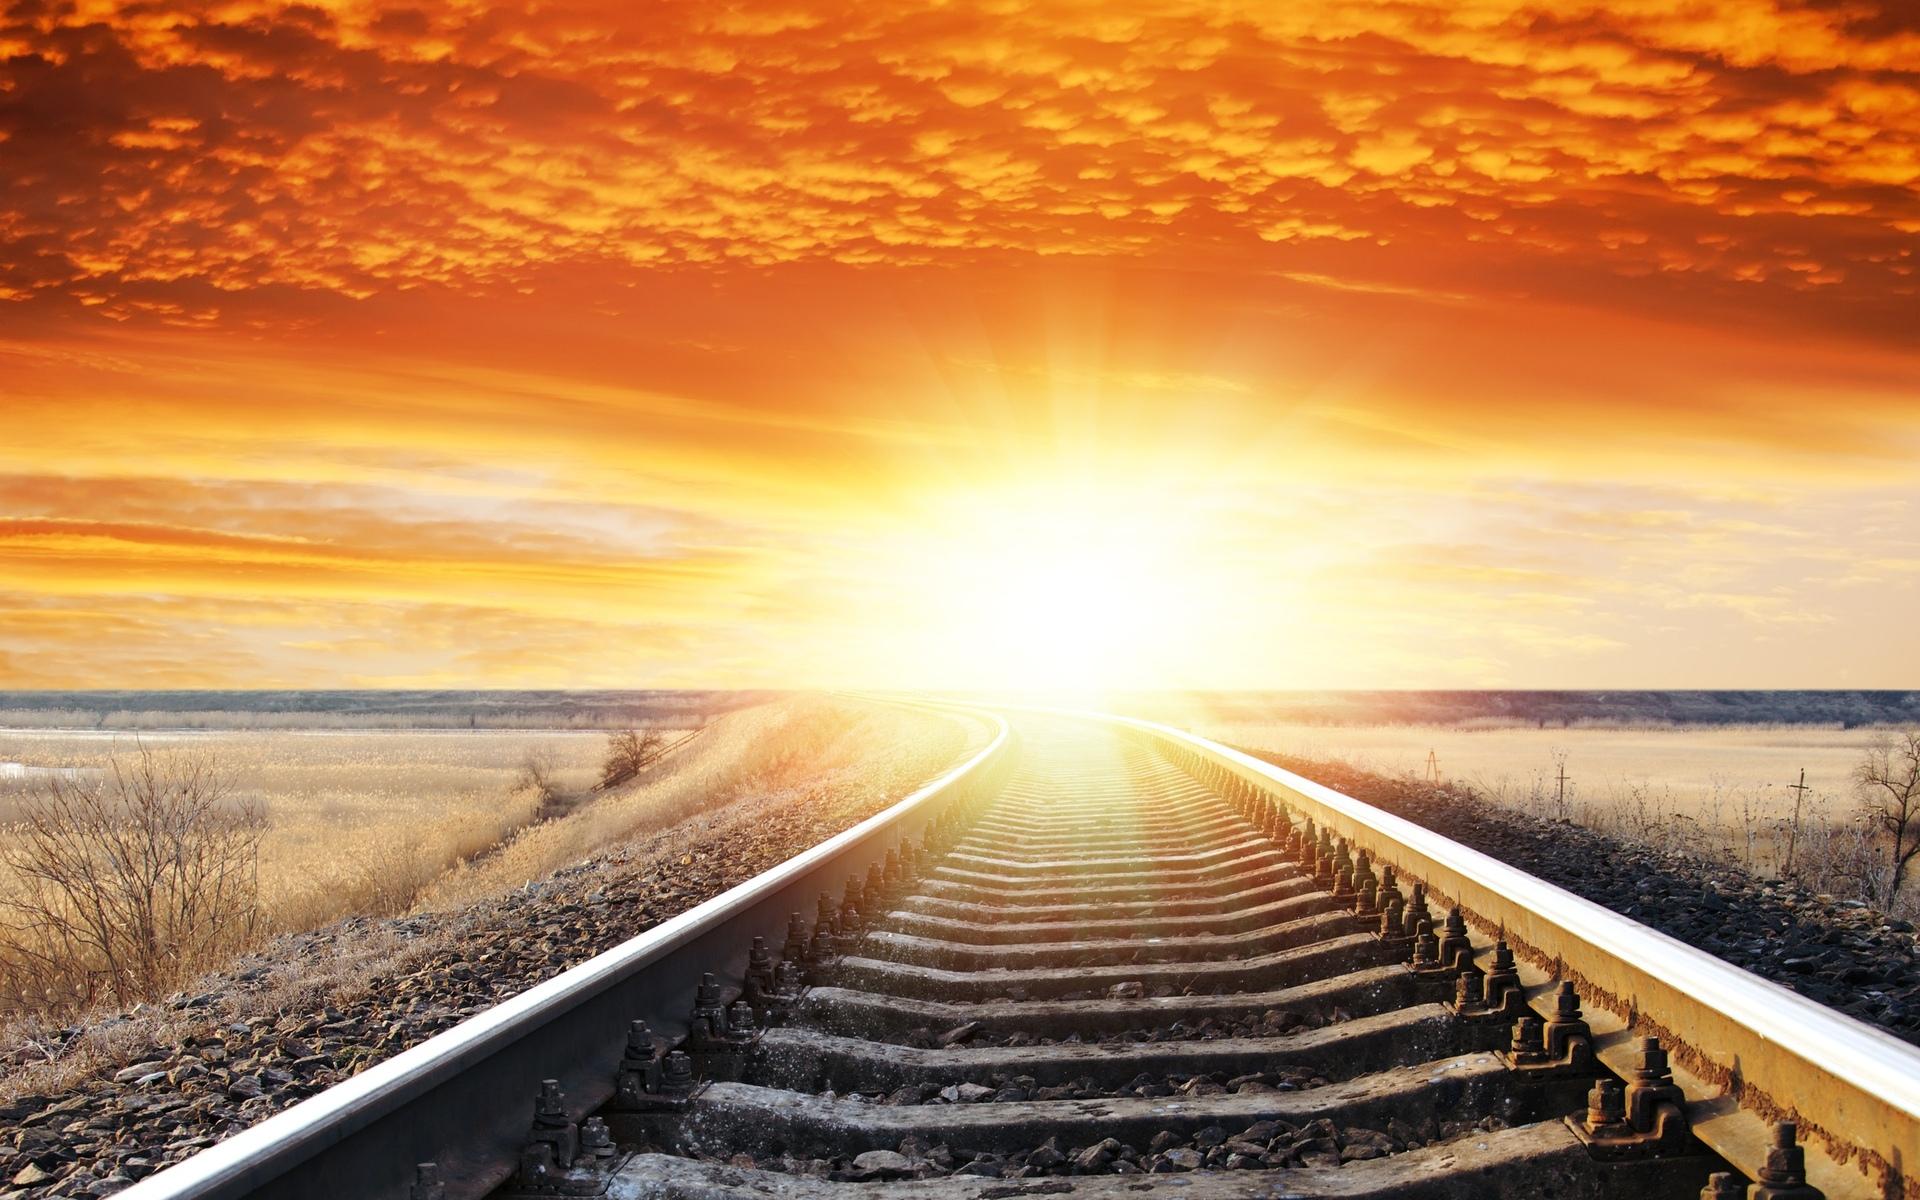 landscape sunset sunrise sky railroad tracks wallpaper background 1920x1200